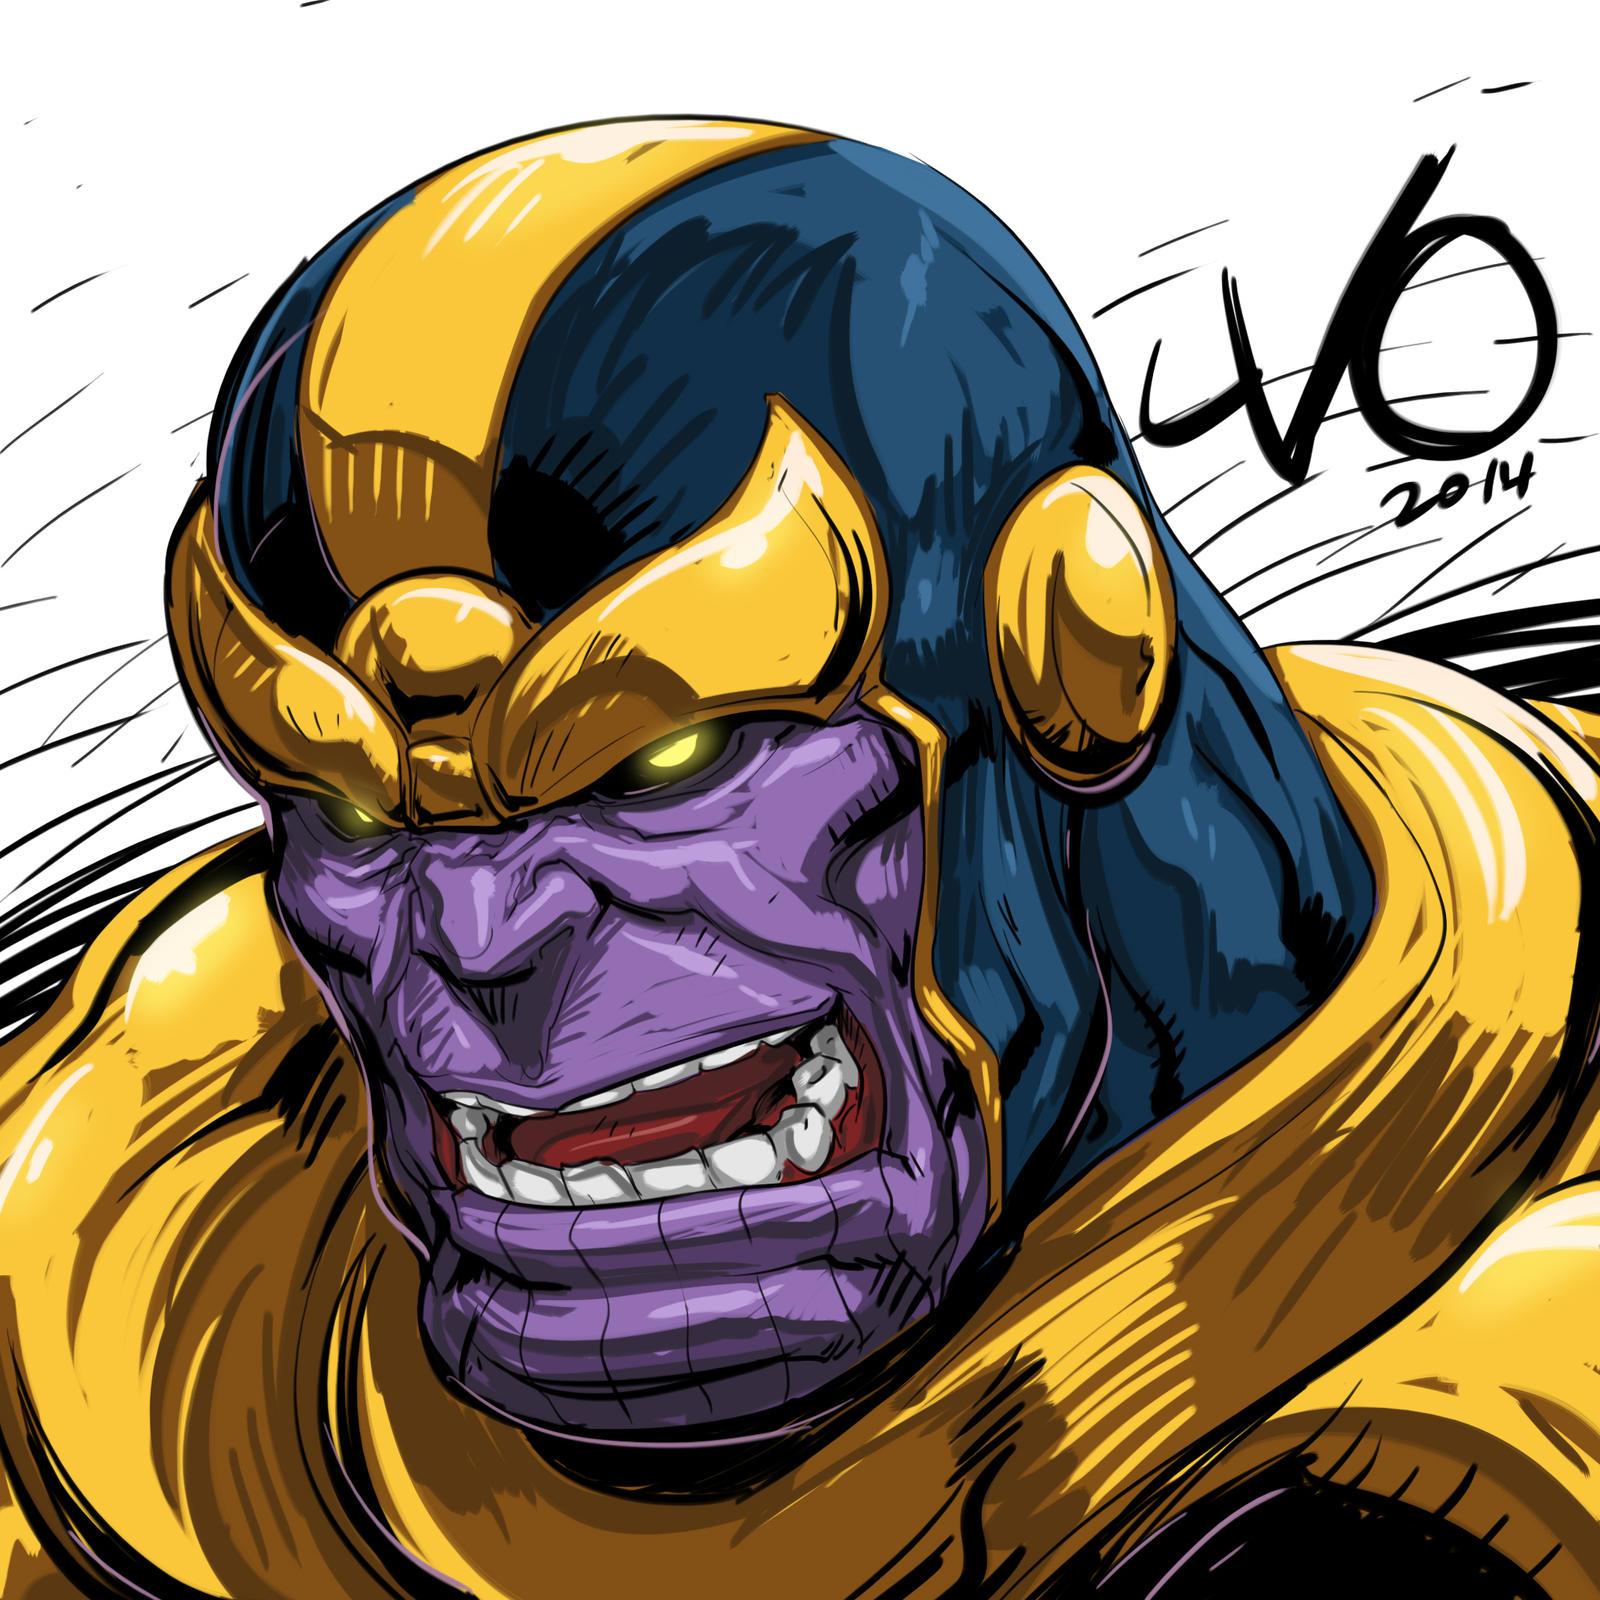 Anime Characters Vs Thanos : Digital sketch warm up thanos by vostalgic on deviantart